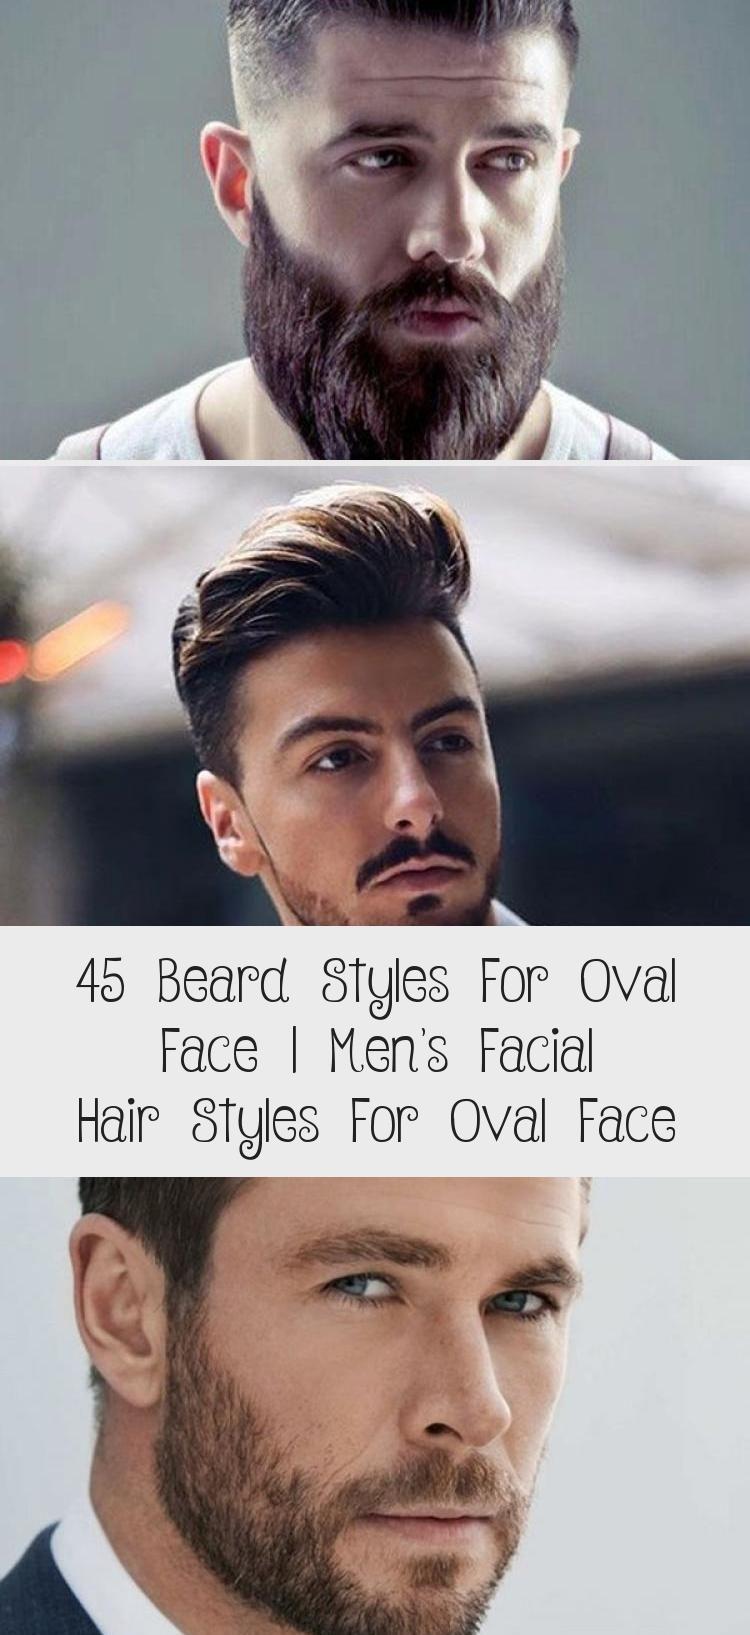 45 beard styles for oval face in 2020 beard styles mens